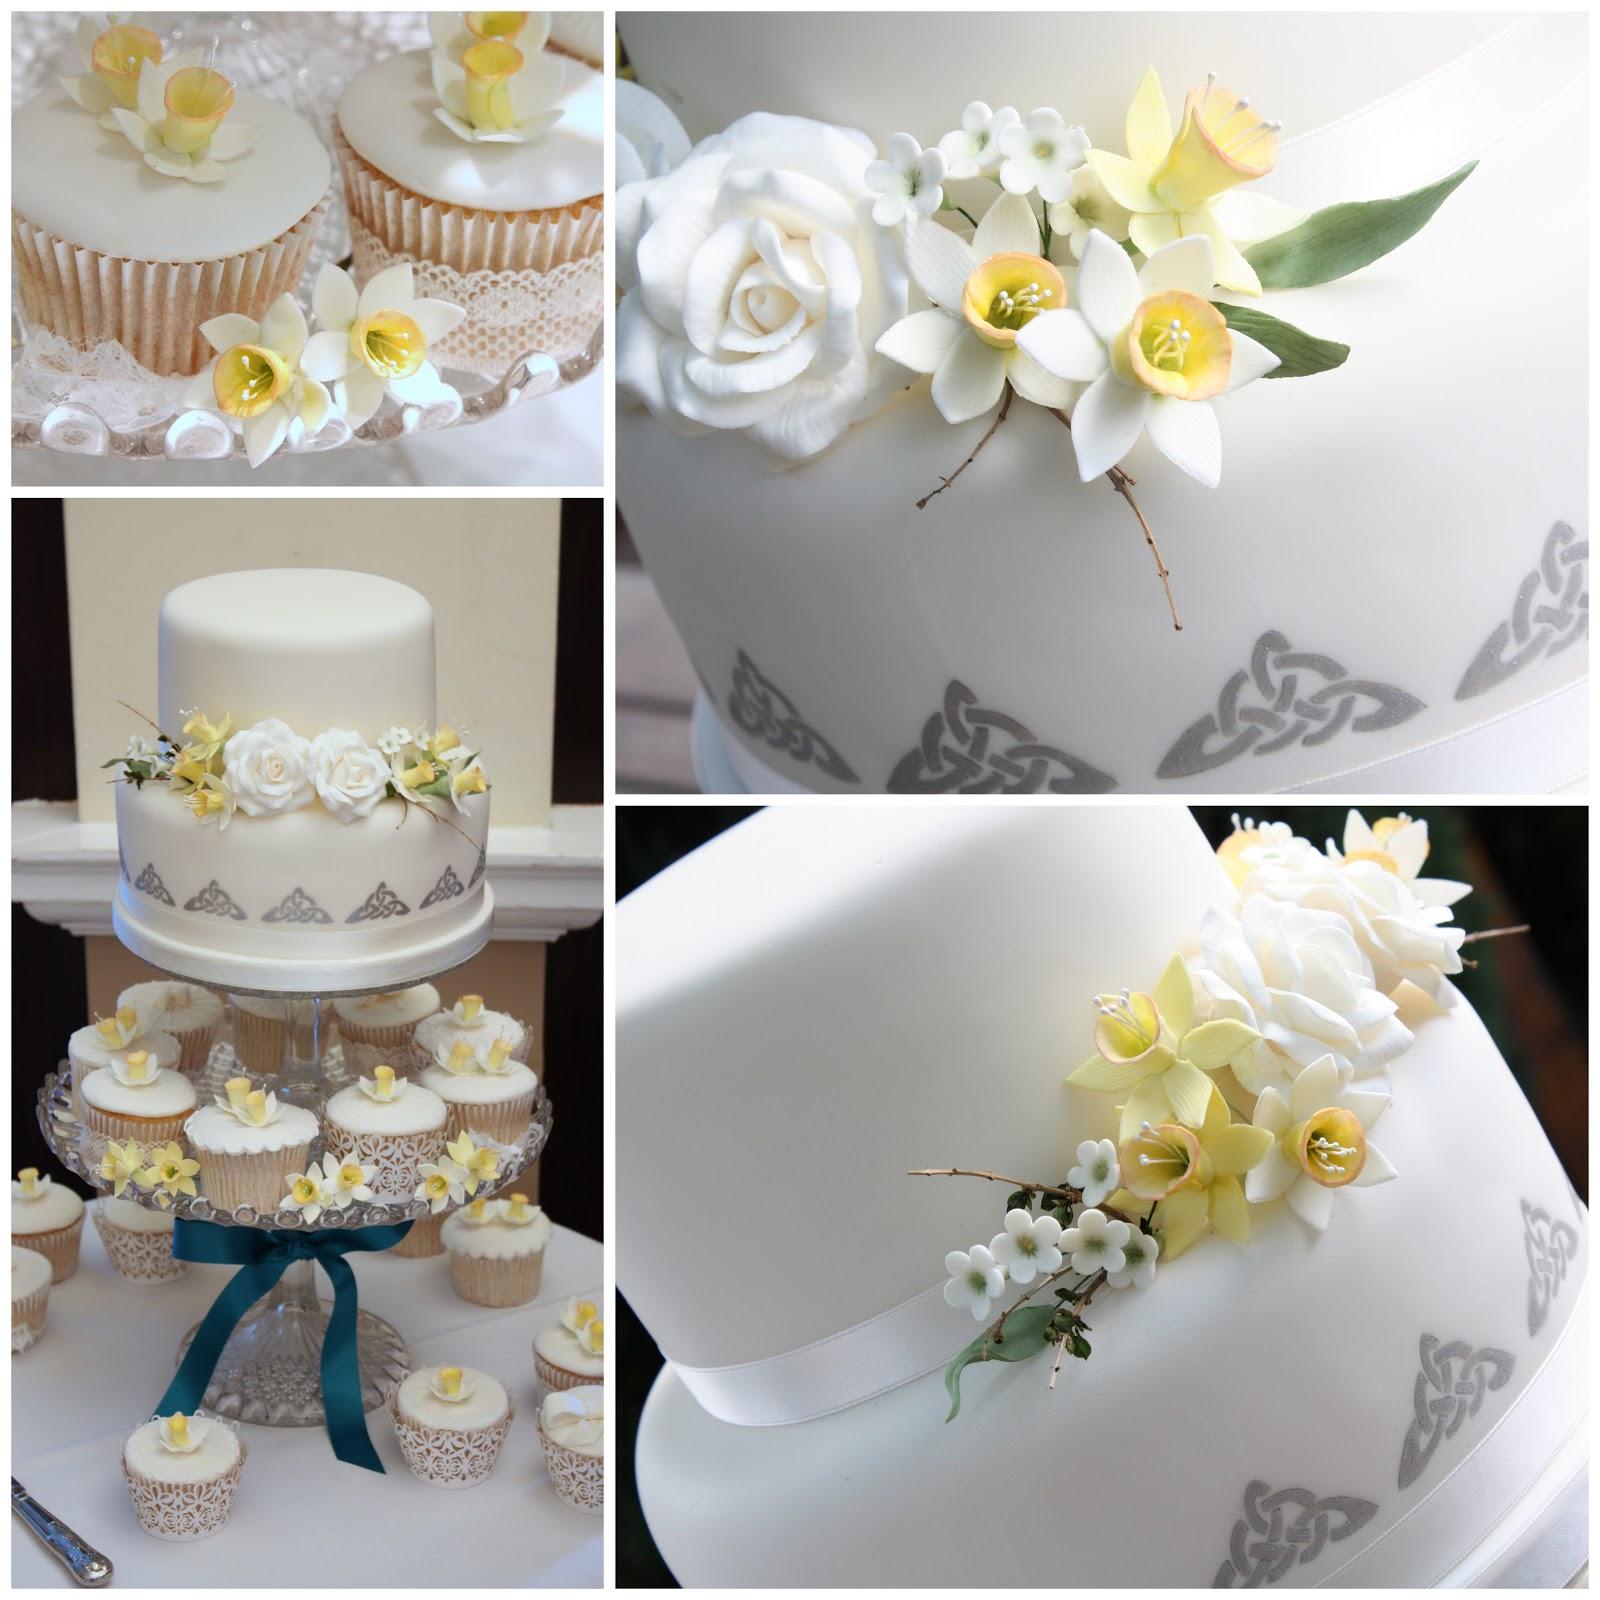 28 celtic knot wedding cake pics photos celtic knot 28 celtic knot wedding cake pics photos celtic knot